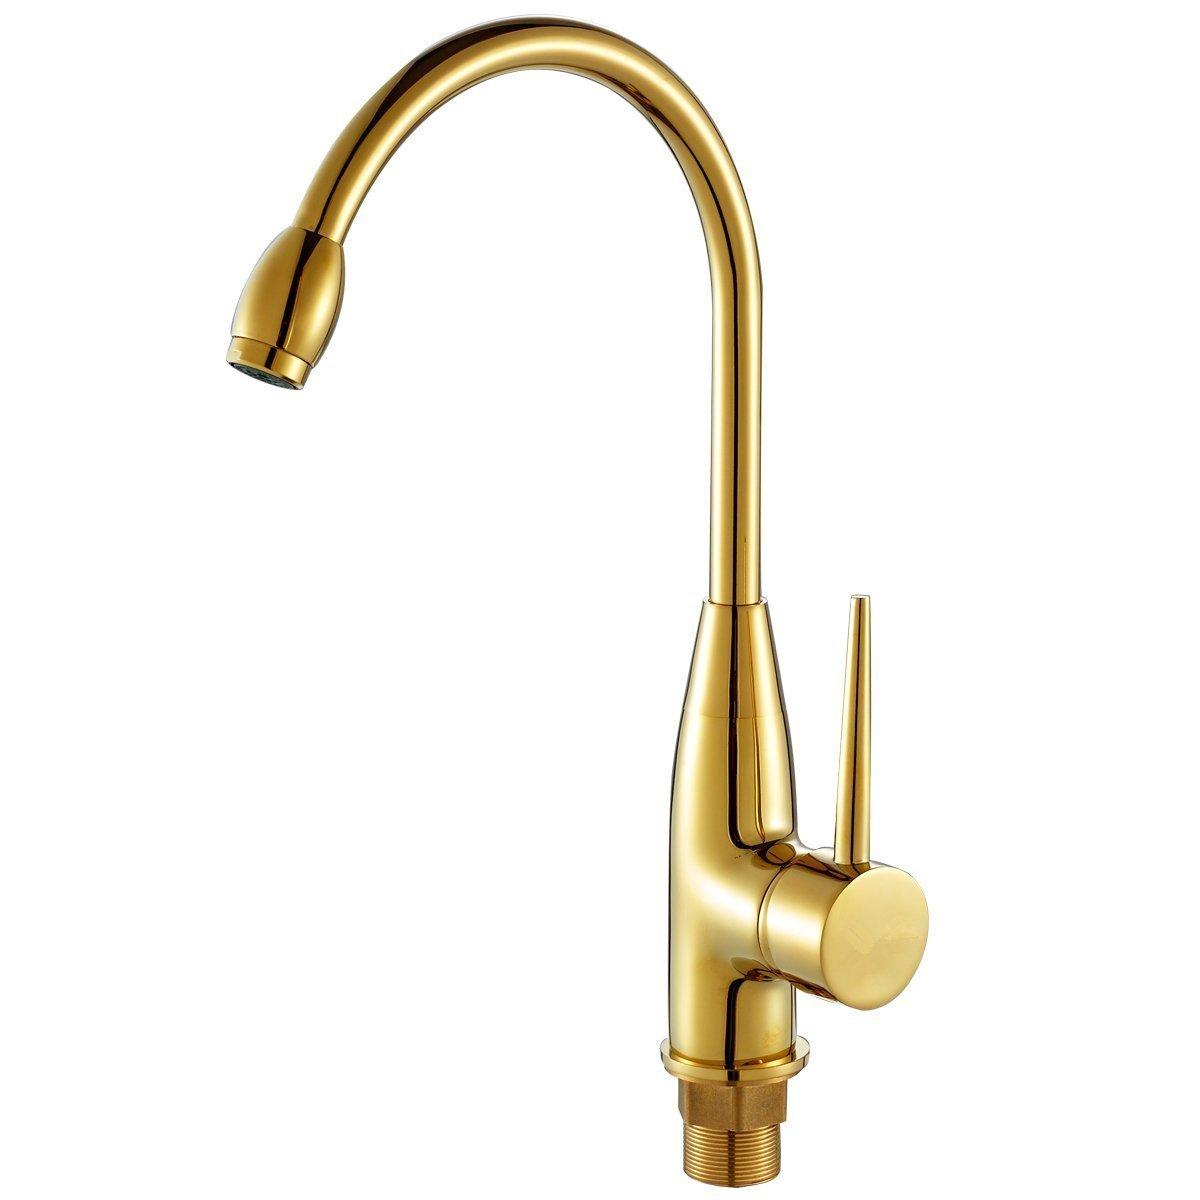 European-style retro basin faucet Antique gold faucet hot and cold faucet full copper kitchen faucet Tyrant Continental gilt gold faucet (hot and cold hose with 60CM) SLT